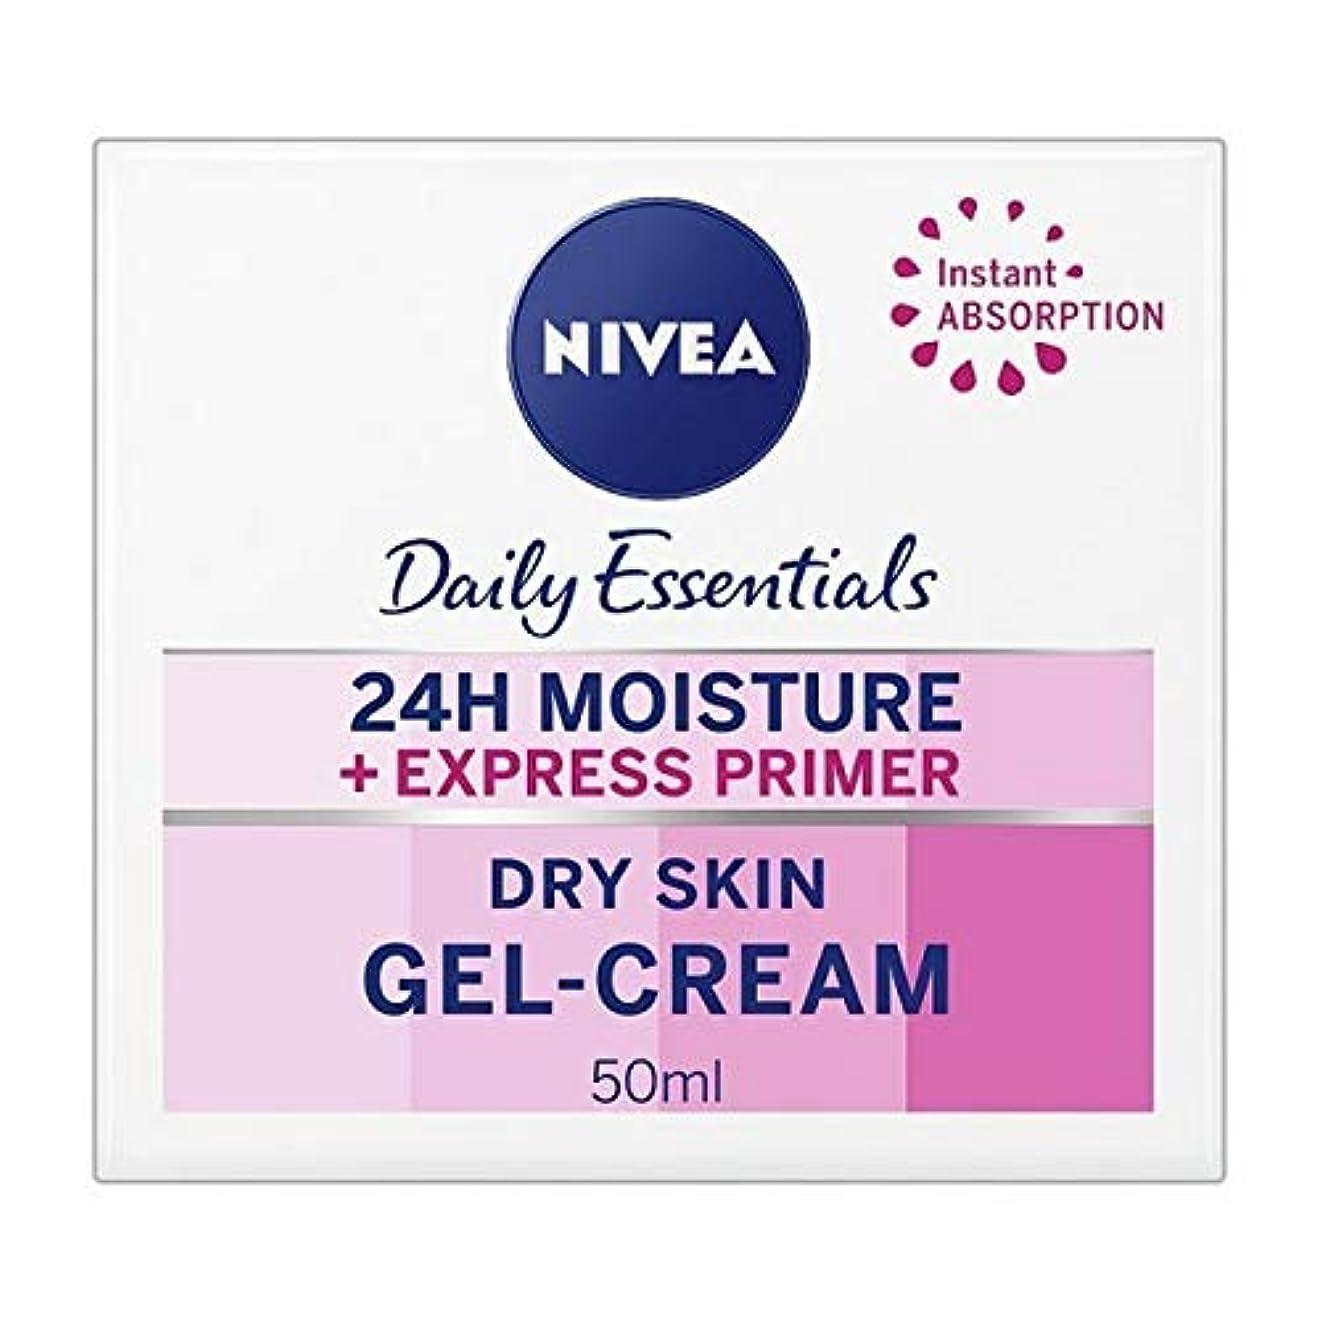 [Nivea ] ニベアエクスプレスプライマーゲルクリーム、50ミリリットル - NIVEA Express Primer Gel-Cream, 50ml [並行輸入品]